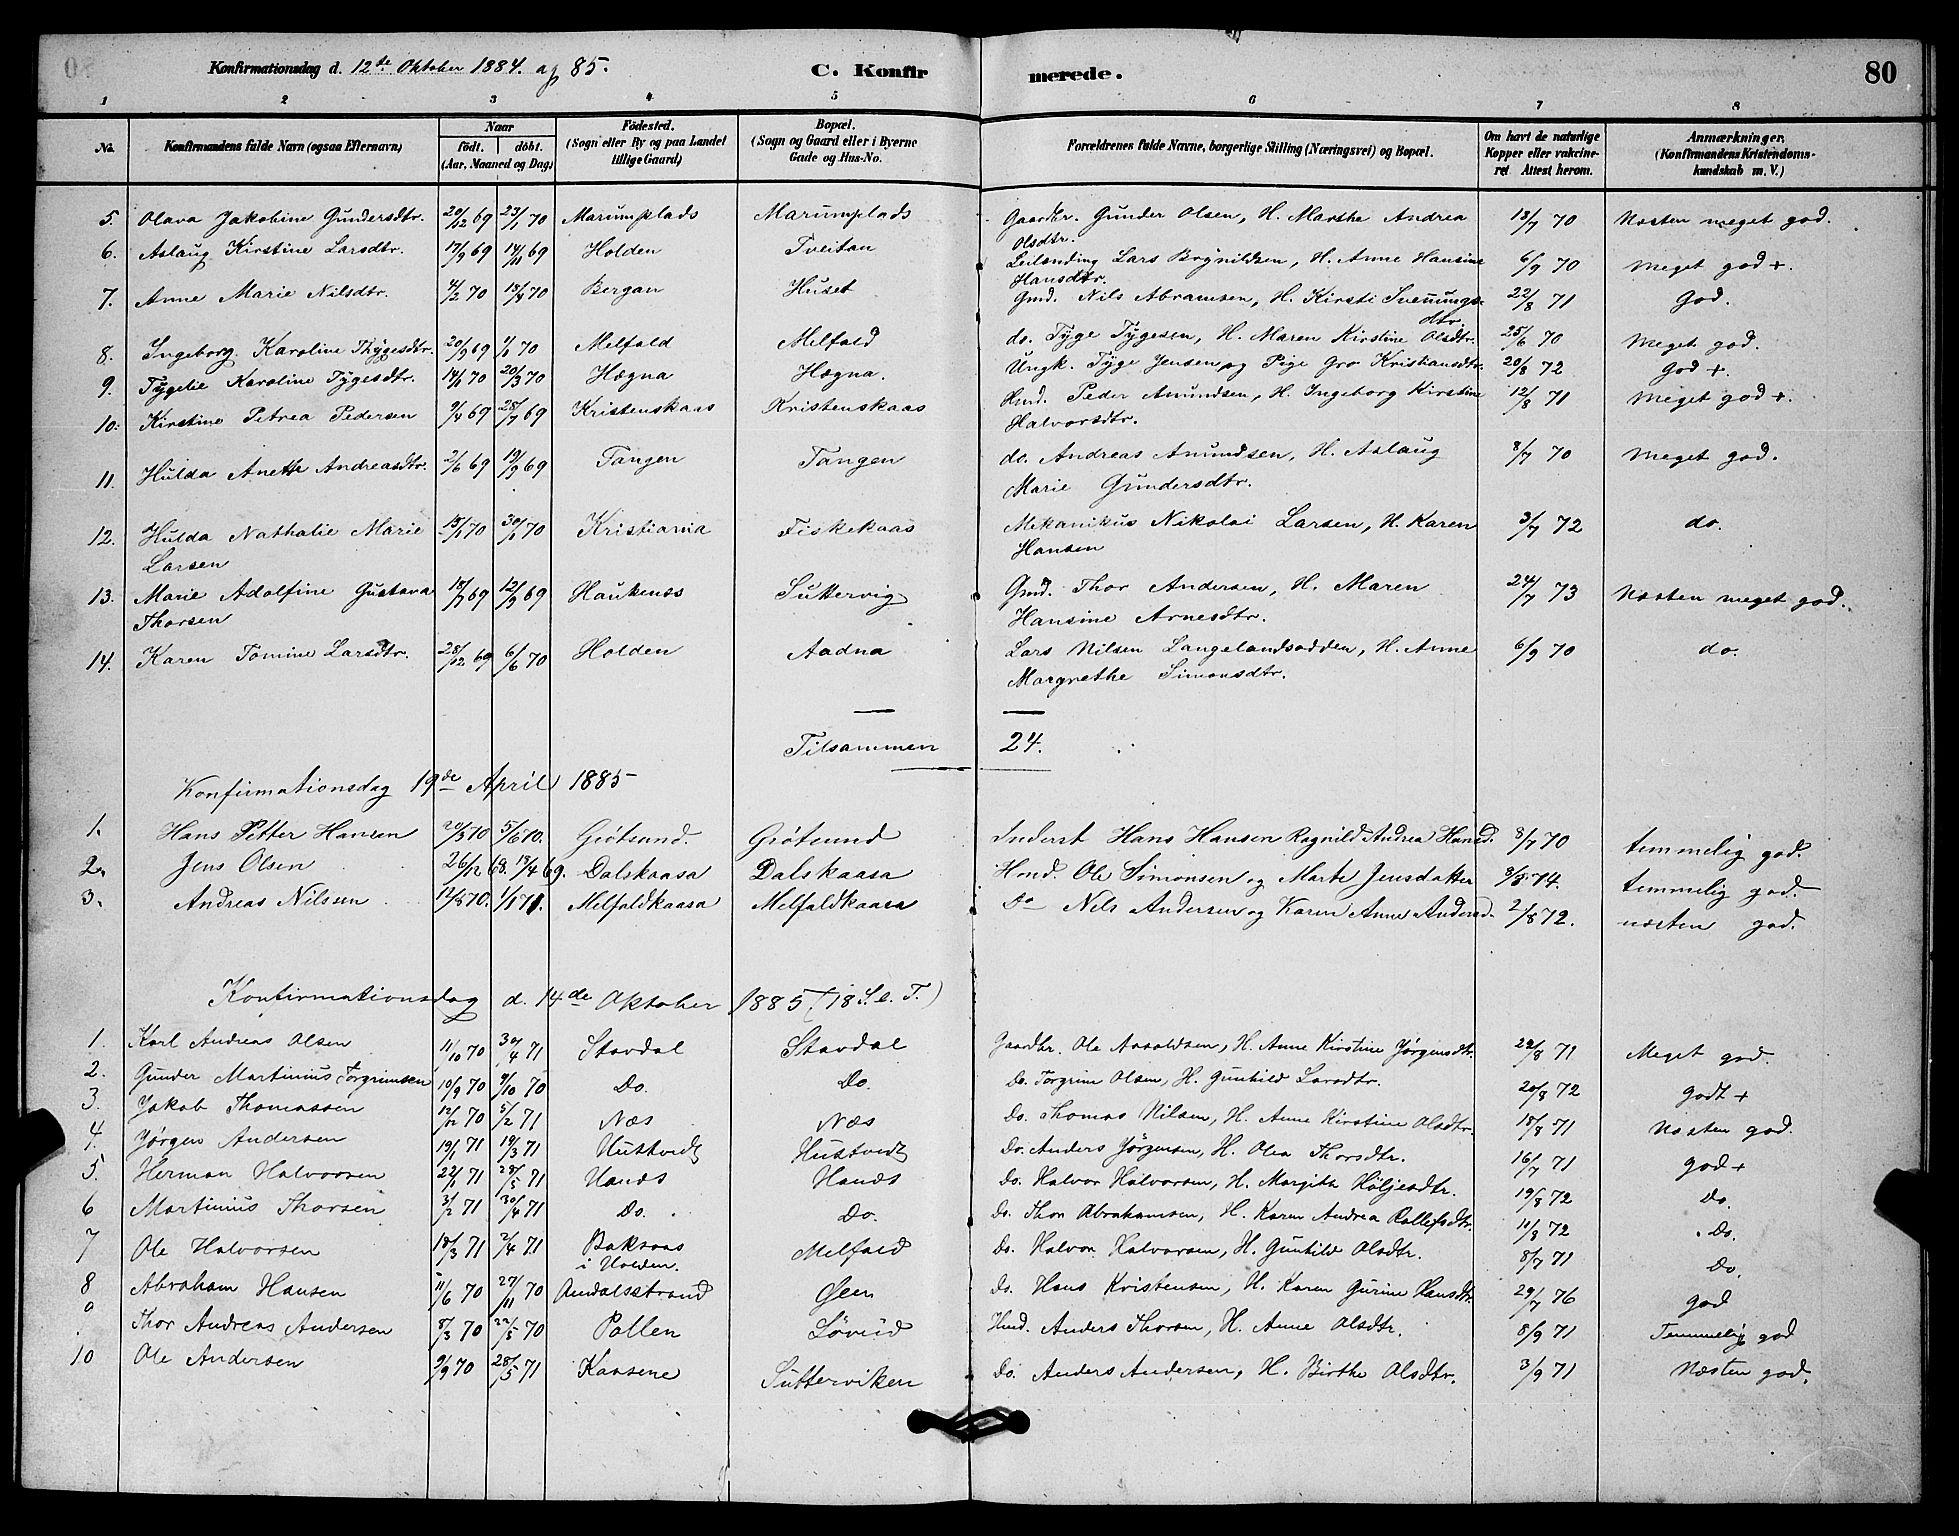 SAKO, Solum kirkebøker, G/Gb/L0003: Klokkerbok nr. II 3, 1880-1898, s. 80